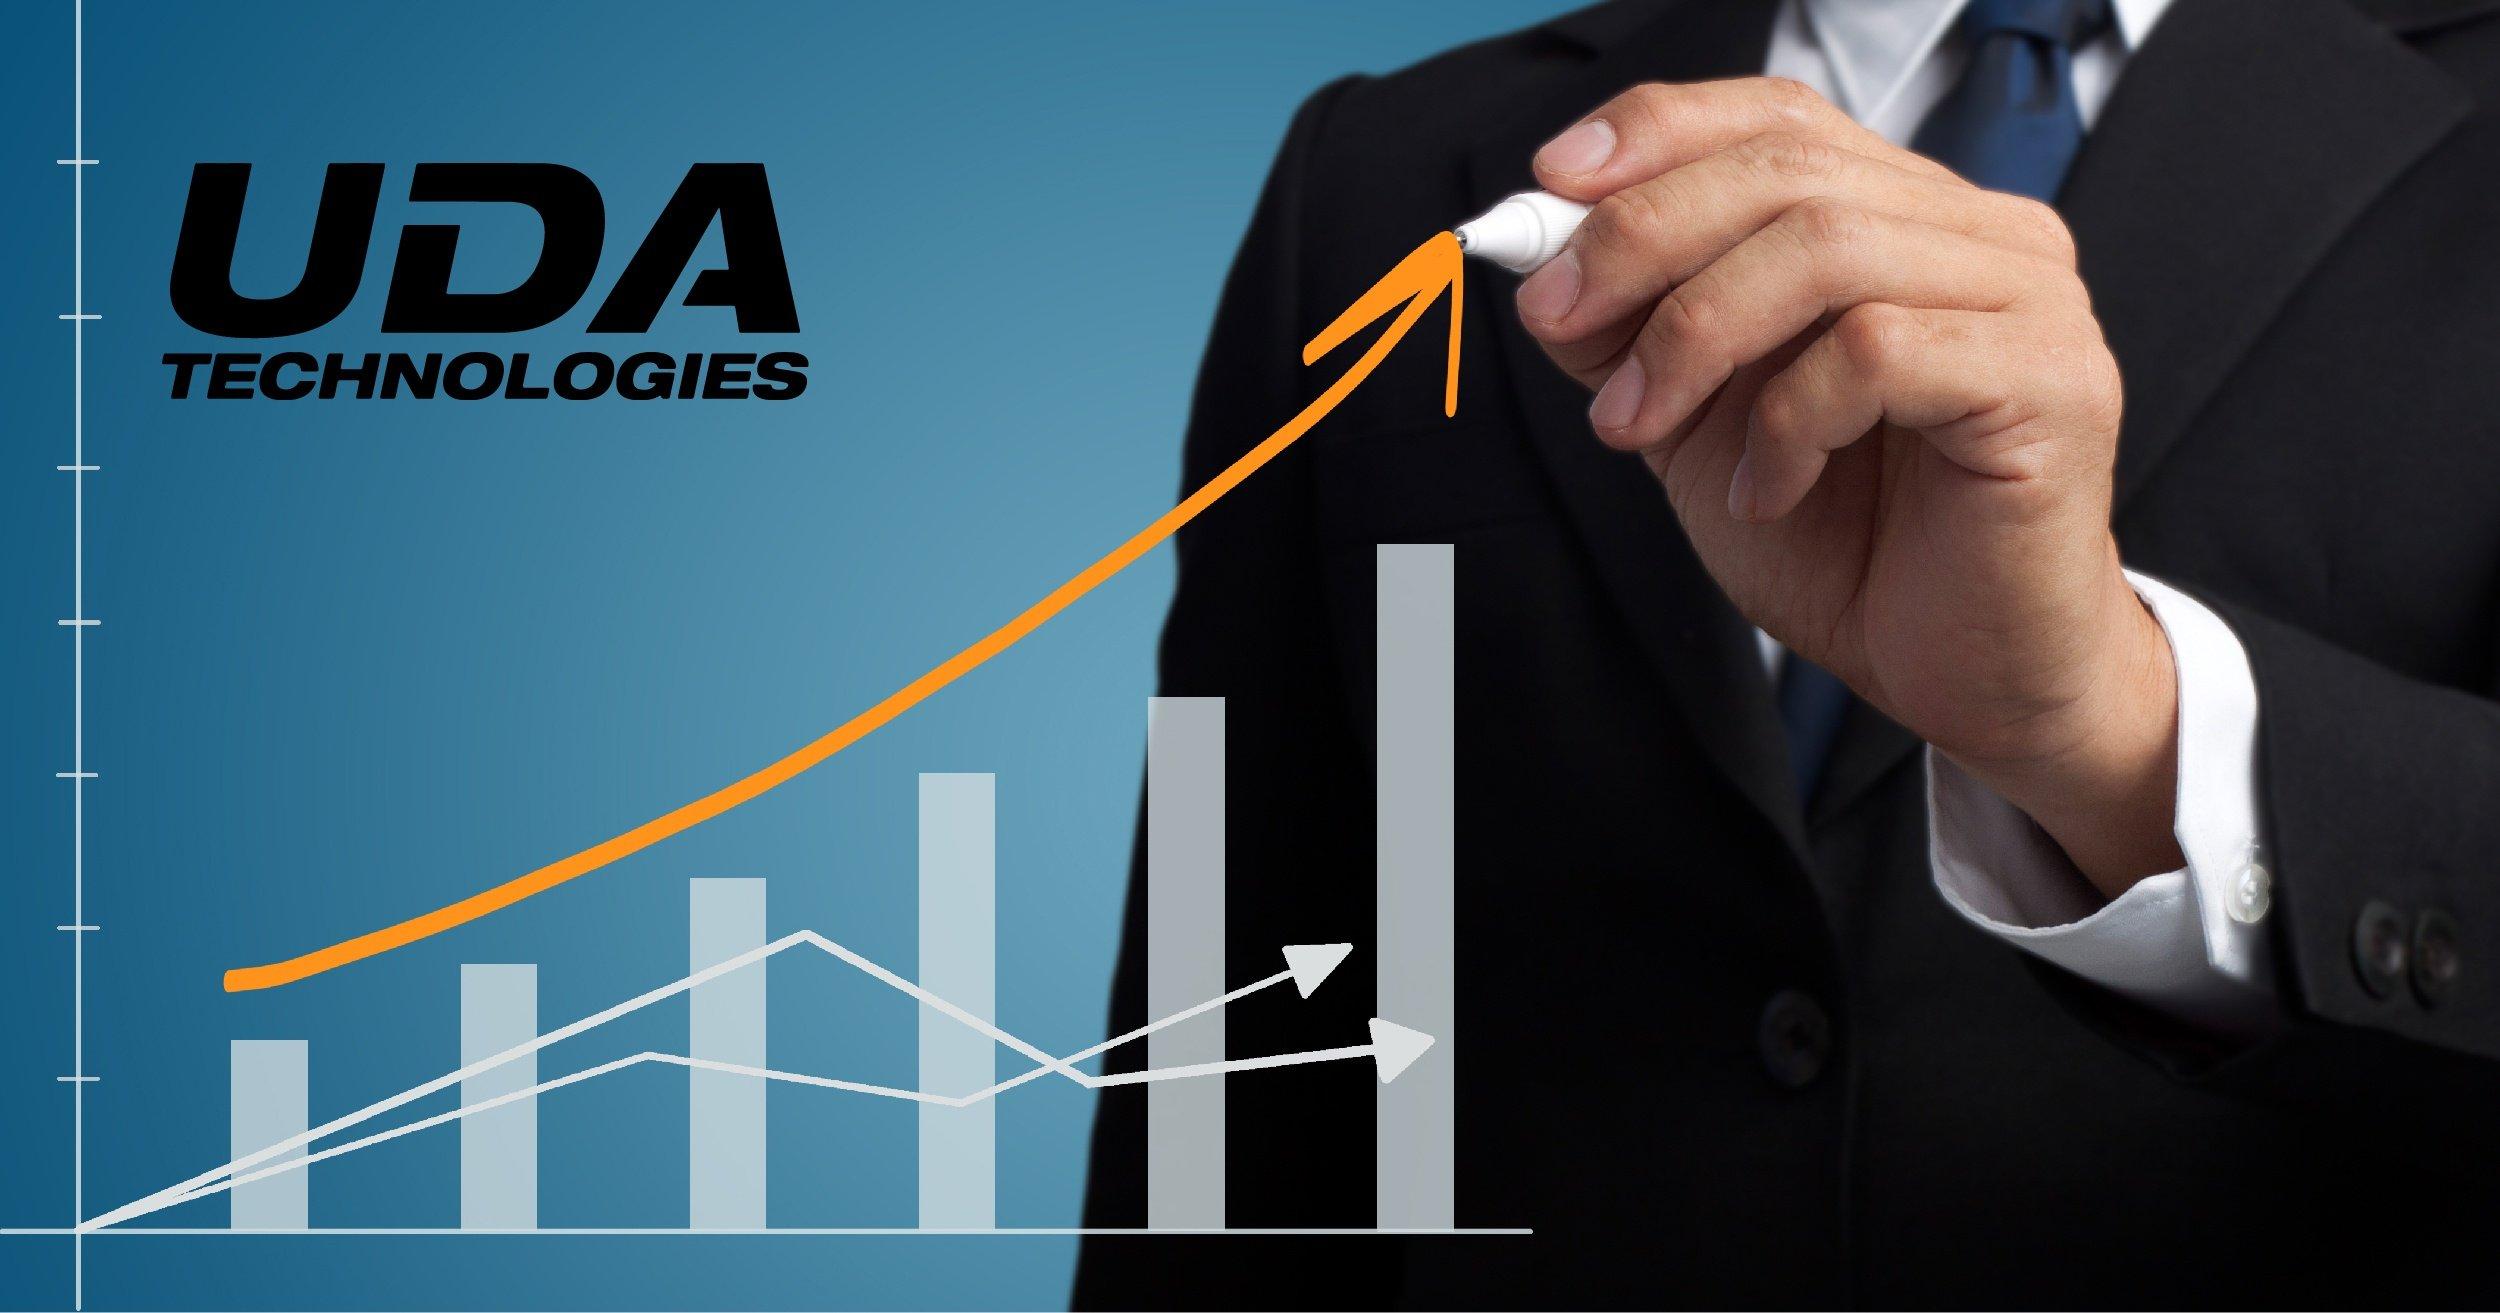 sales-growth-news-01